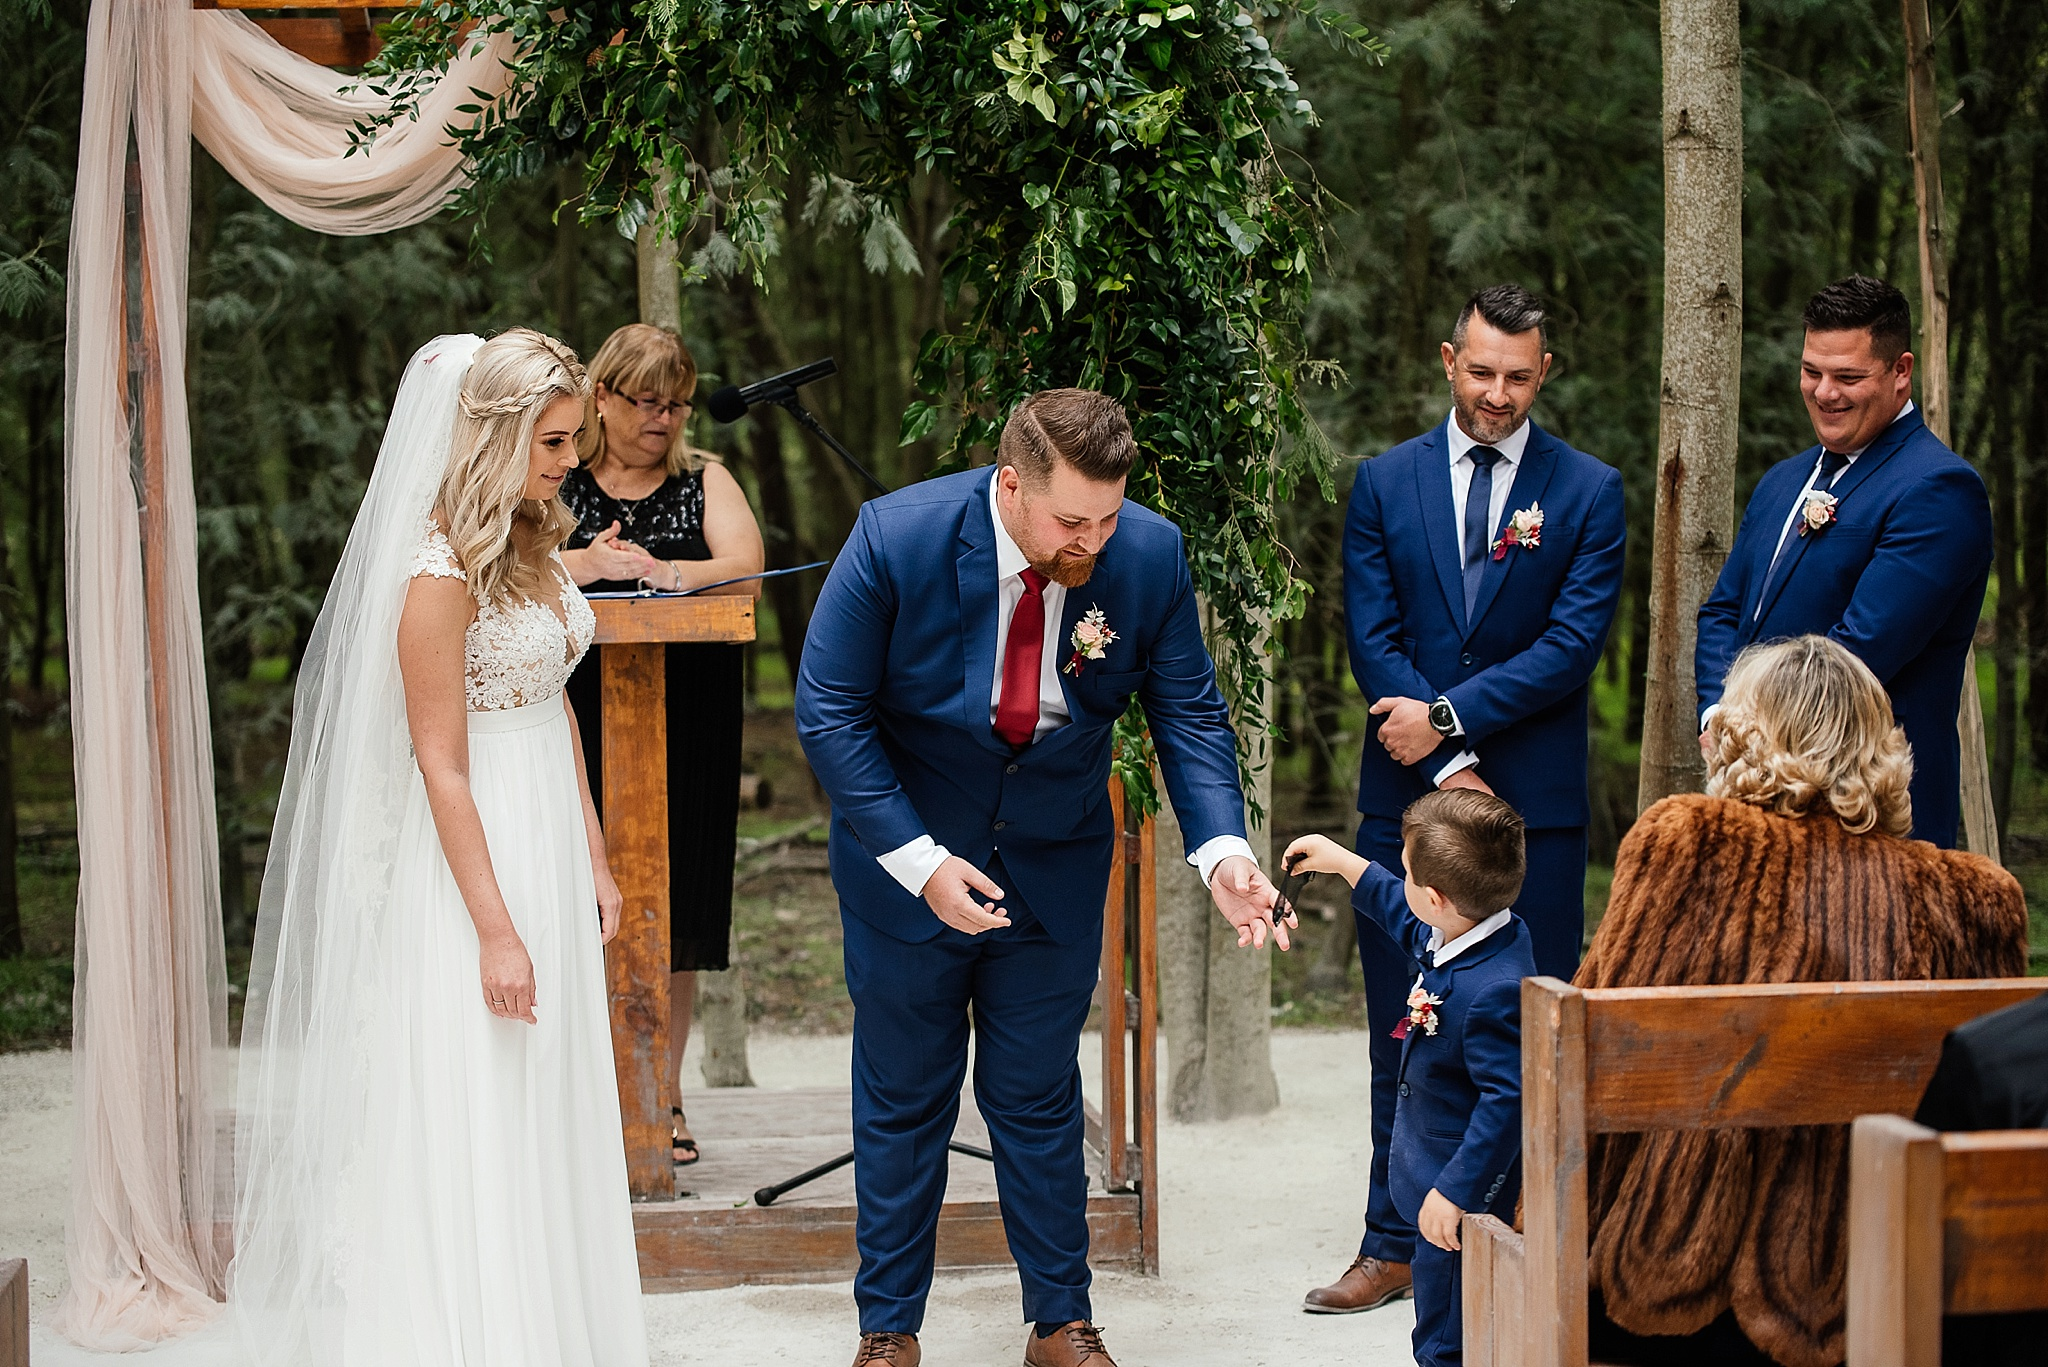 Cape Town Photographer Darren Bester - Die Woud Wedding - Gareth & Roxanne_0021.jpg